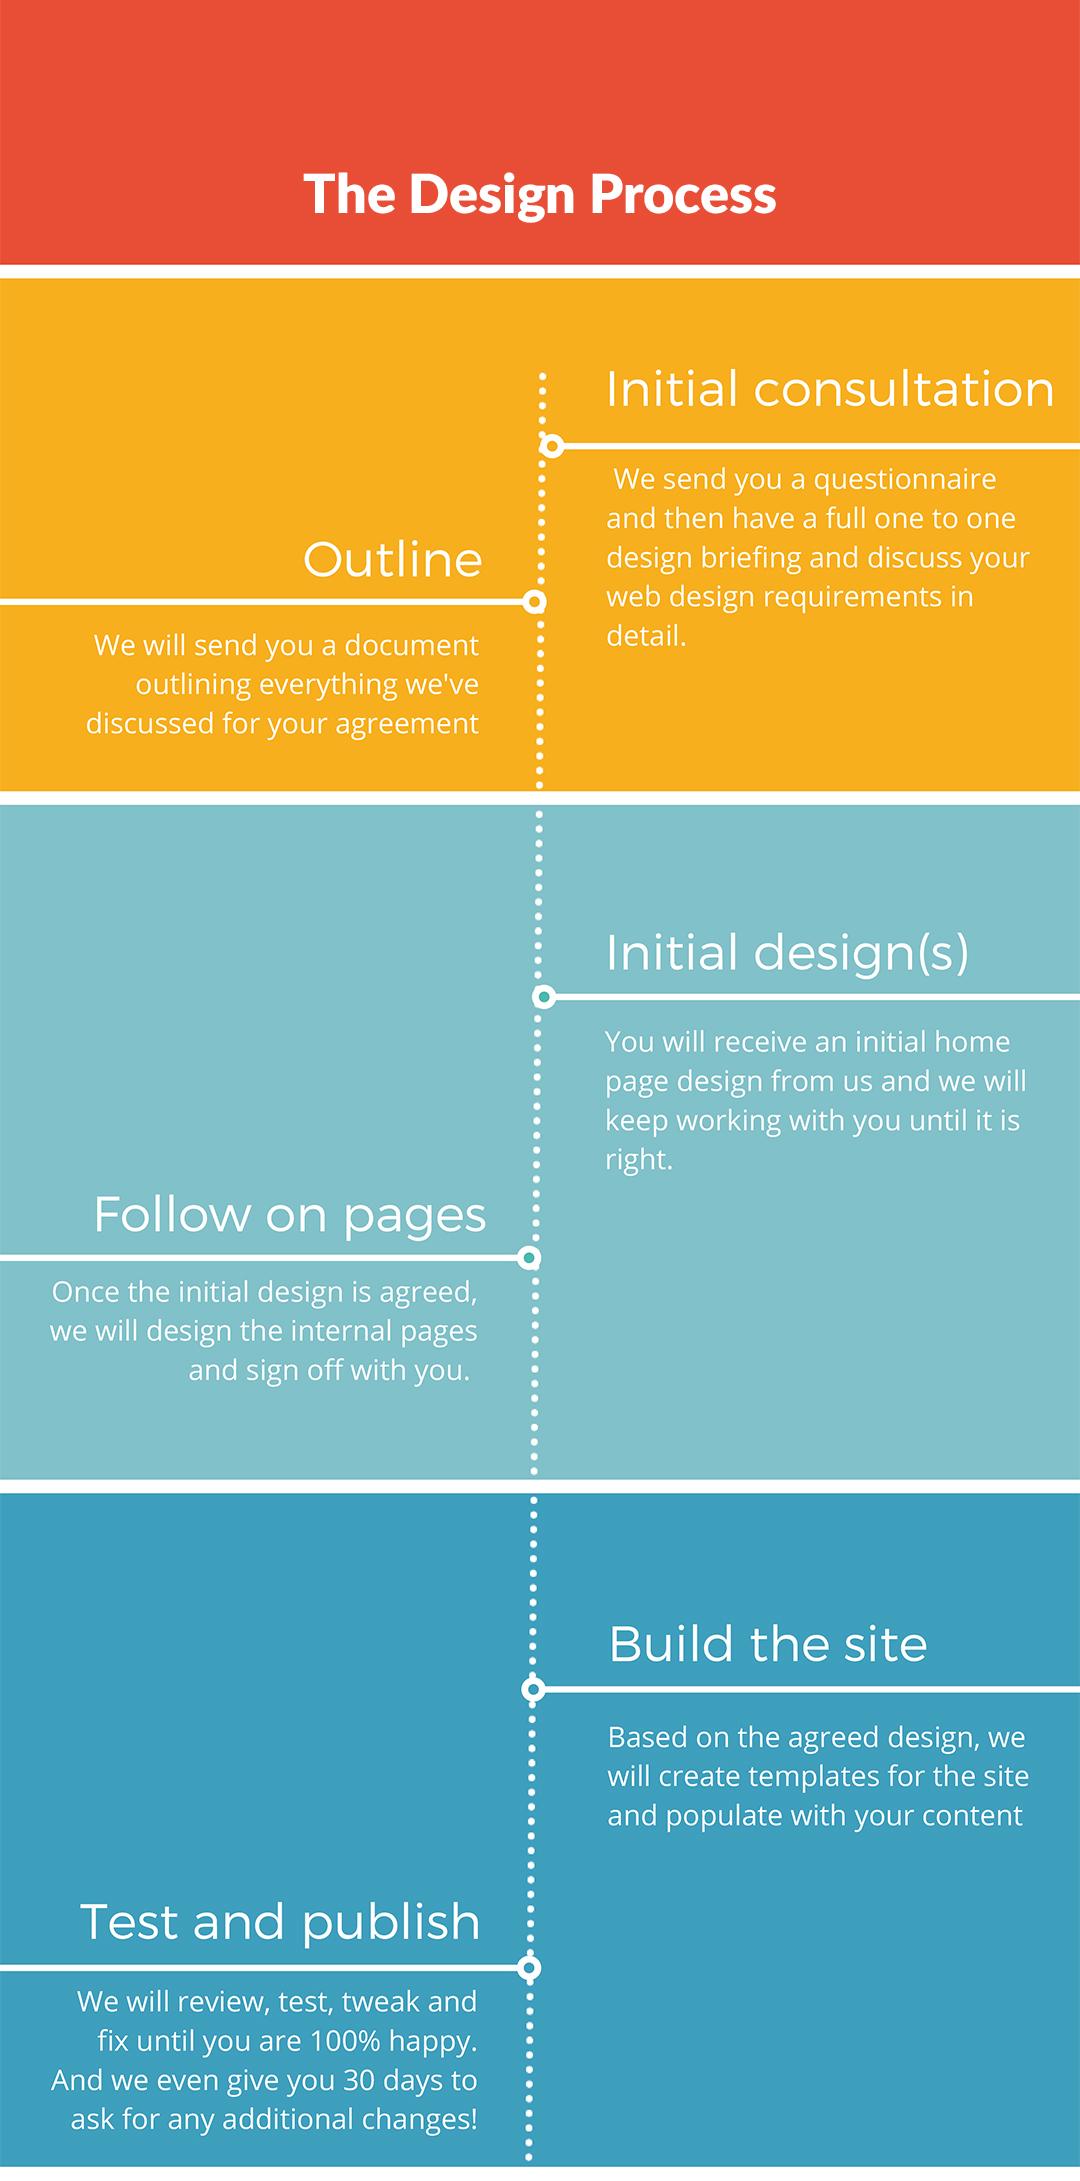 Springmedia design process